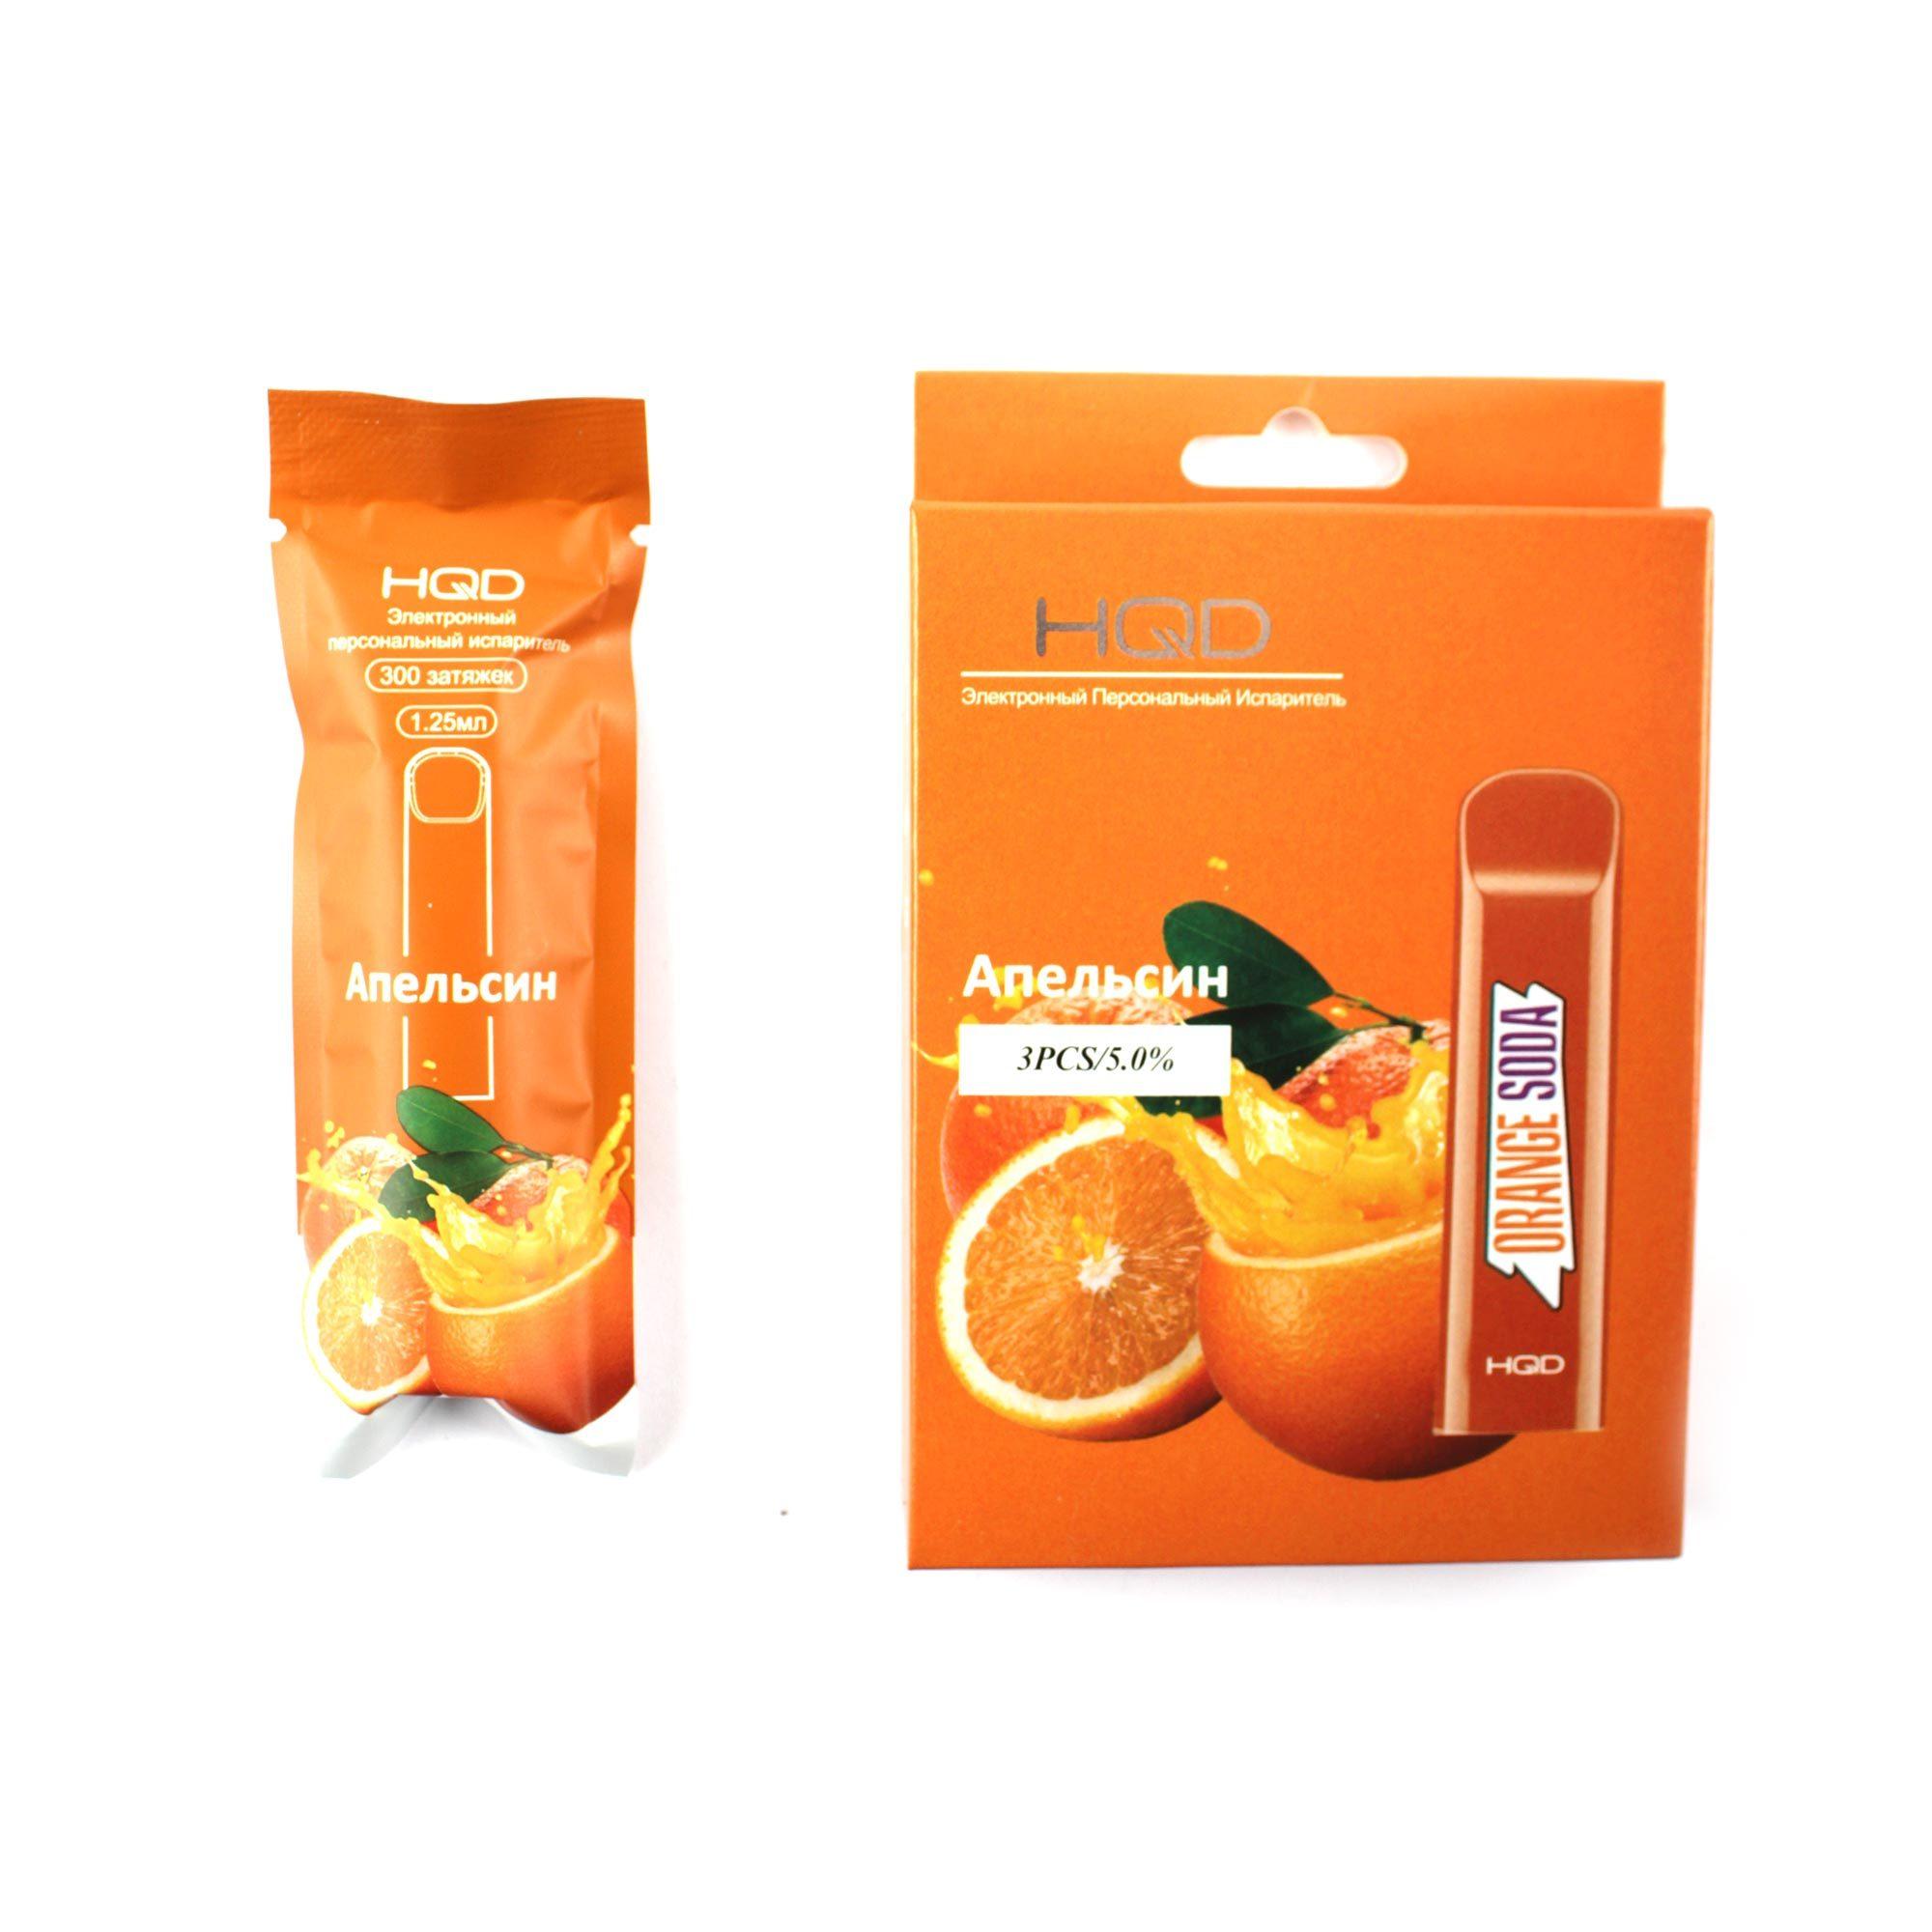 Одноразовая электронная сигарета HQD Orange (Апельсин)